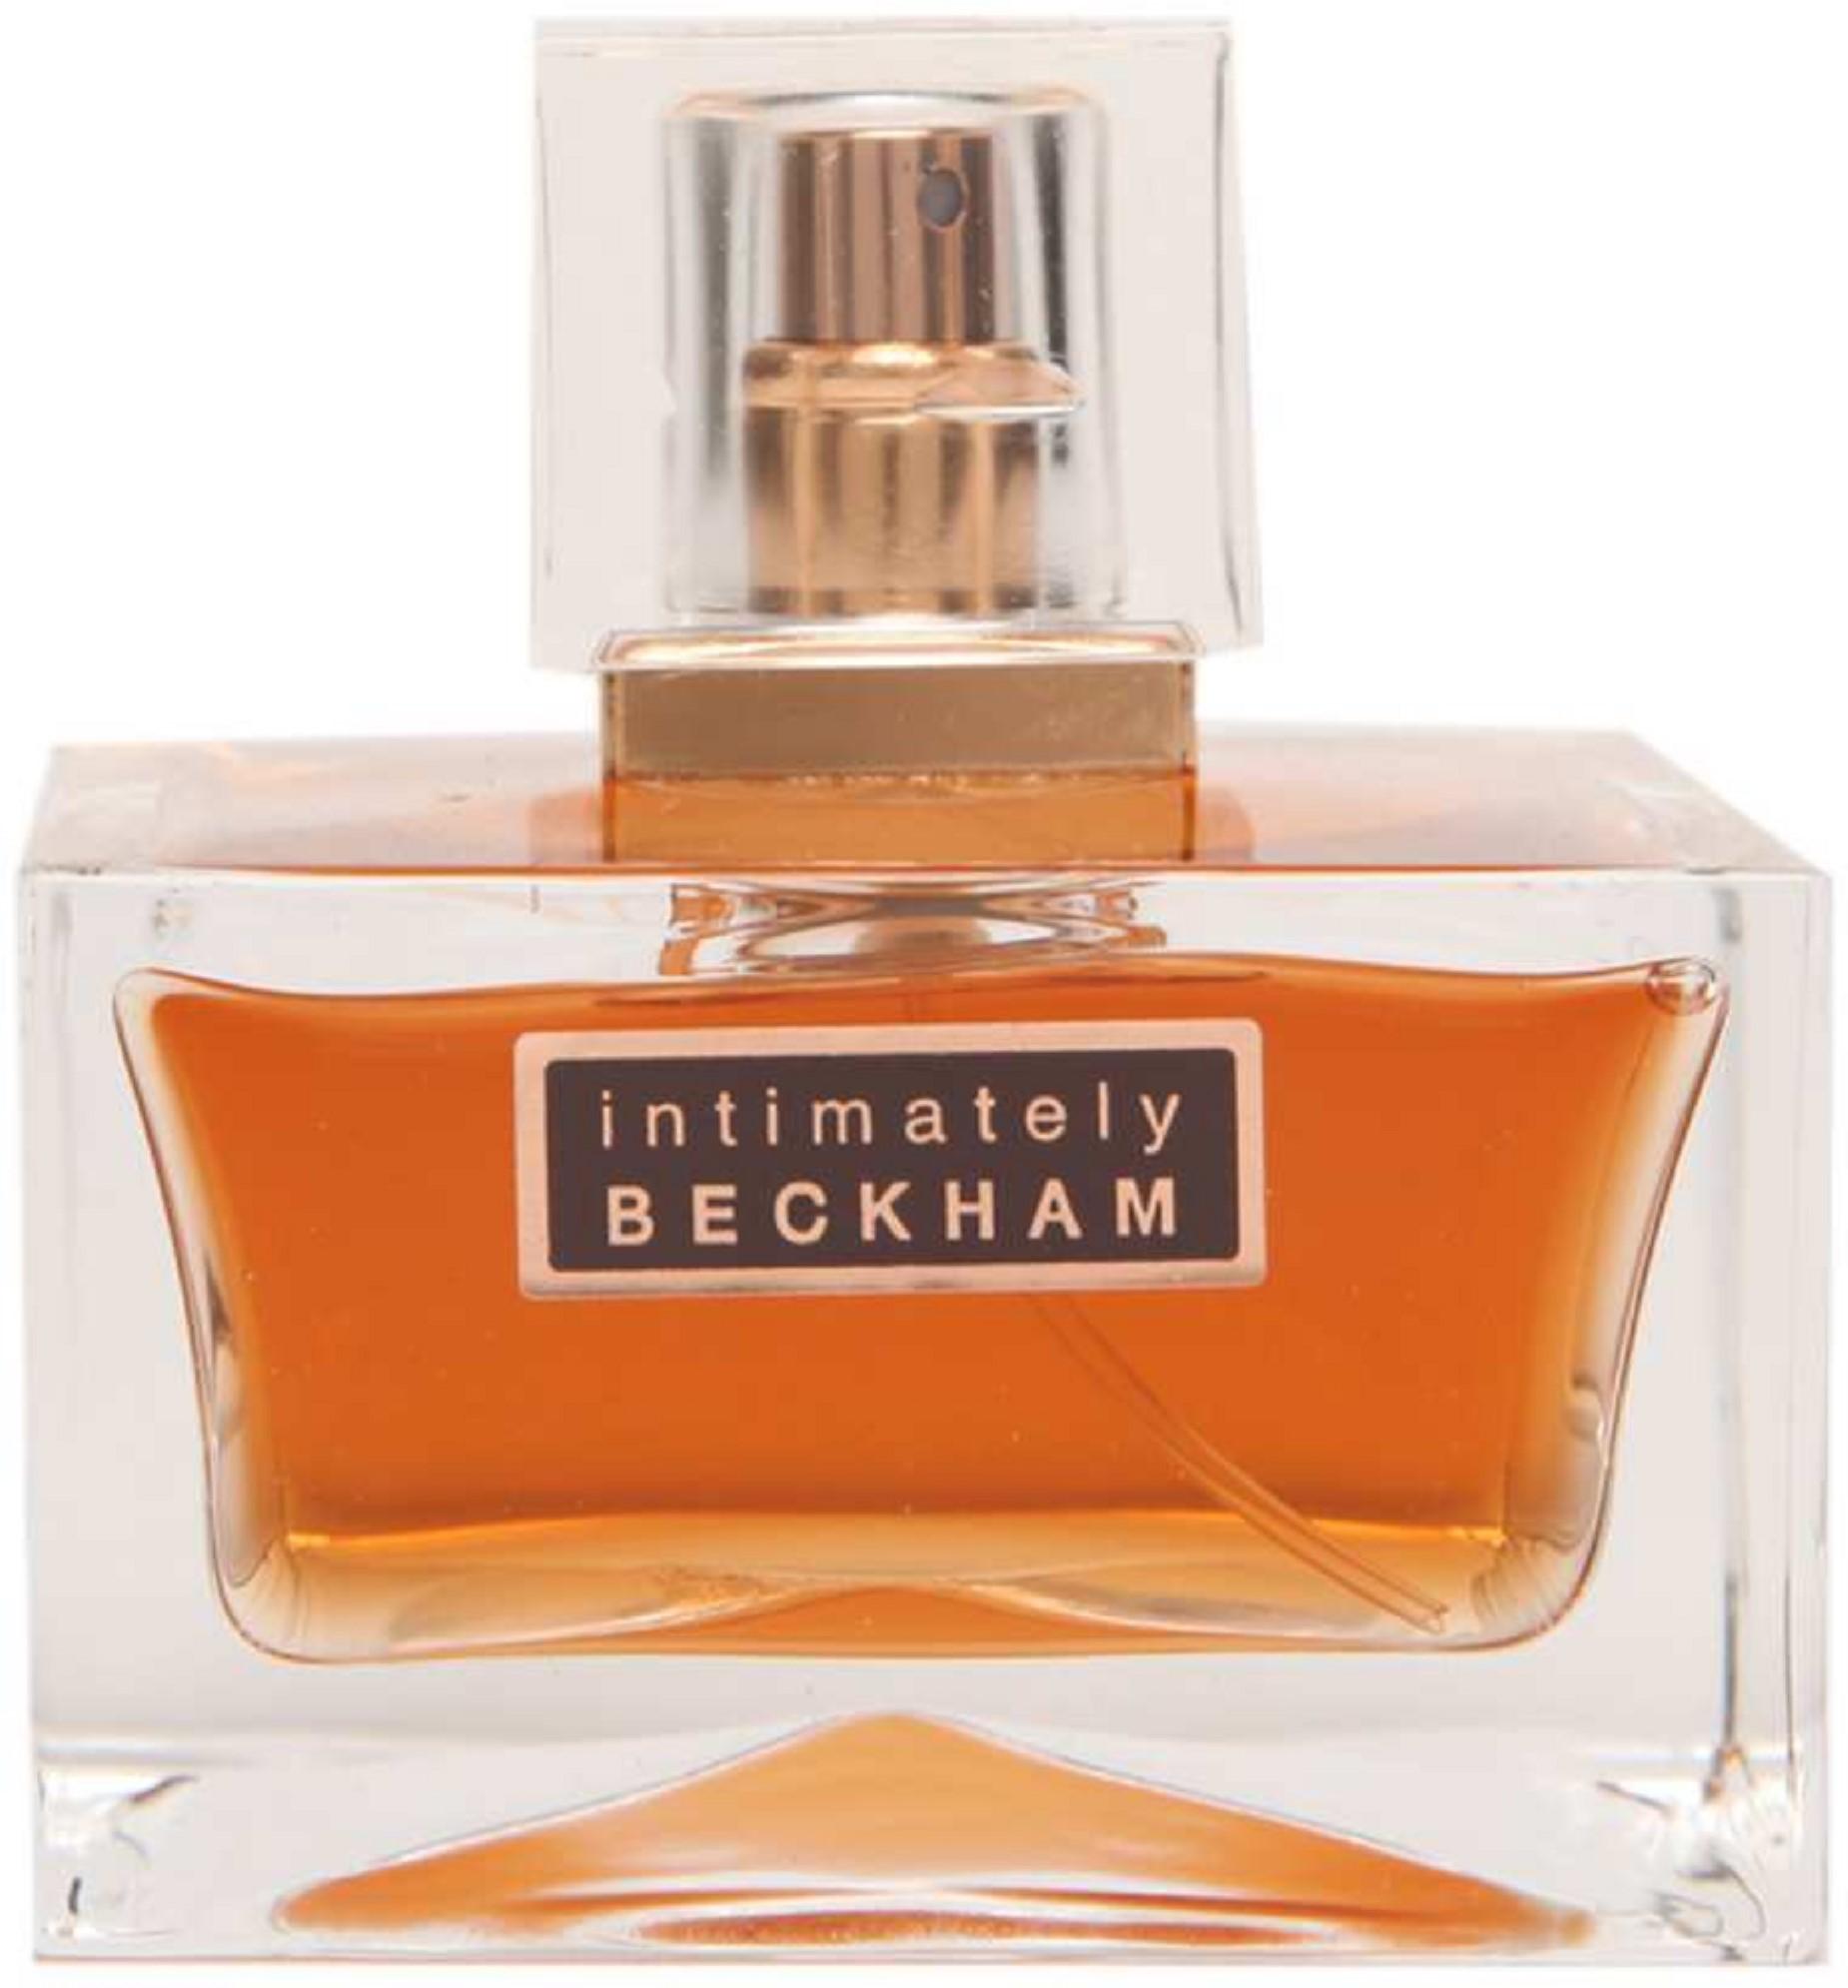 2 Pack - Intimately Beckham By David Beckham Eau de Toilette Spray for Men 2.5 oz